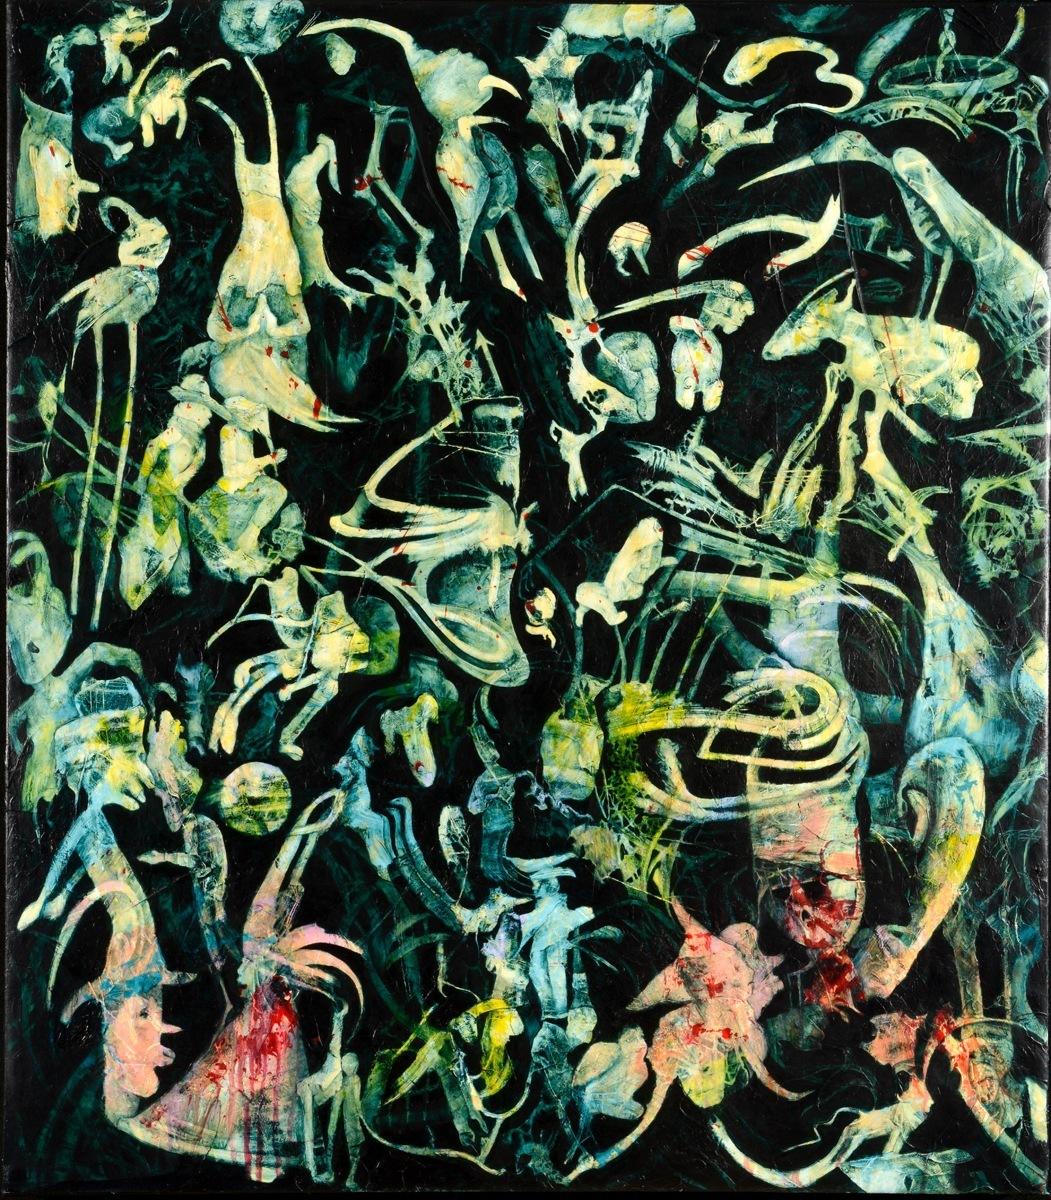 Liminal World series - #2 (large view)